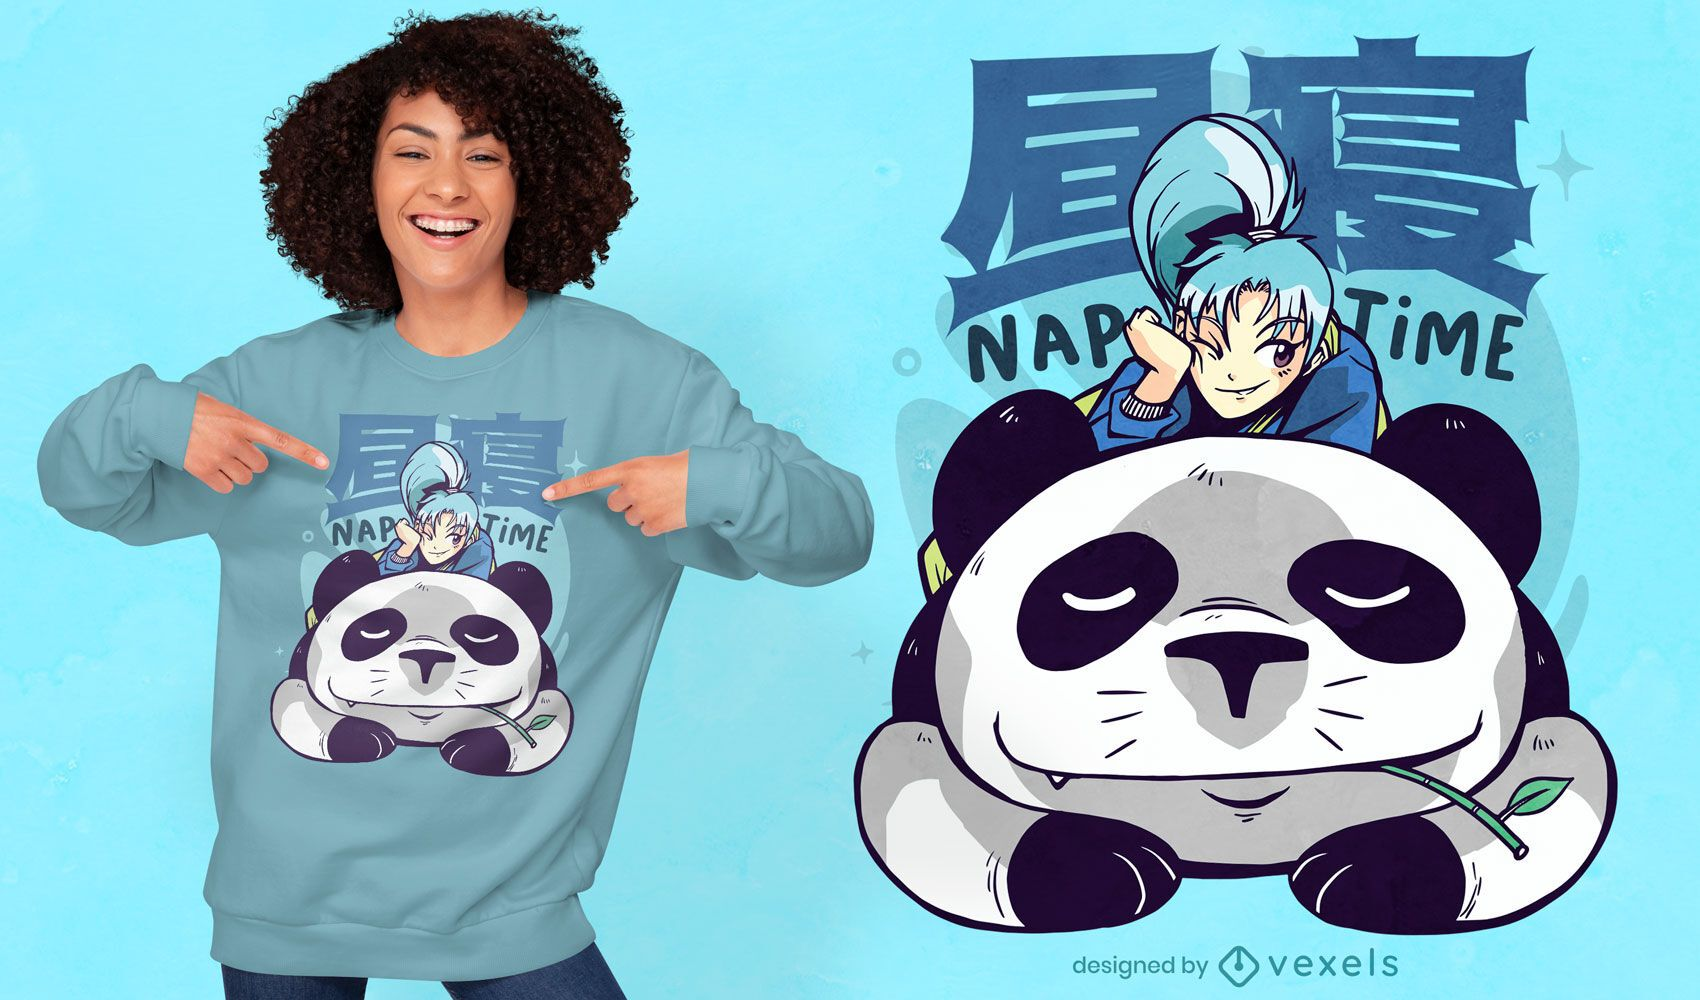 Panda nap time anime t-shirt design